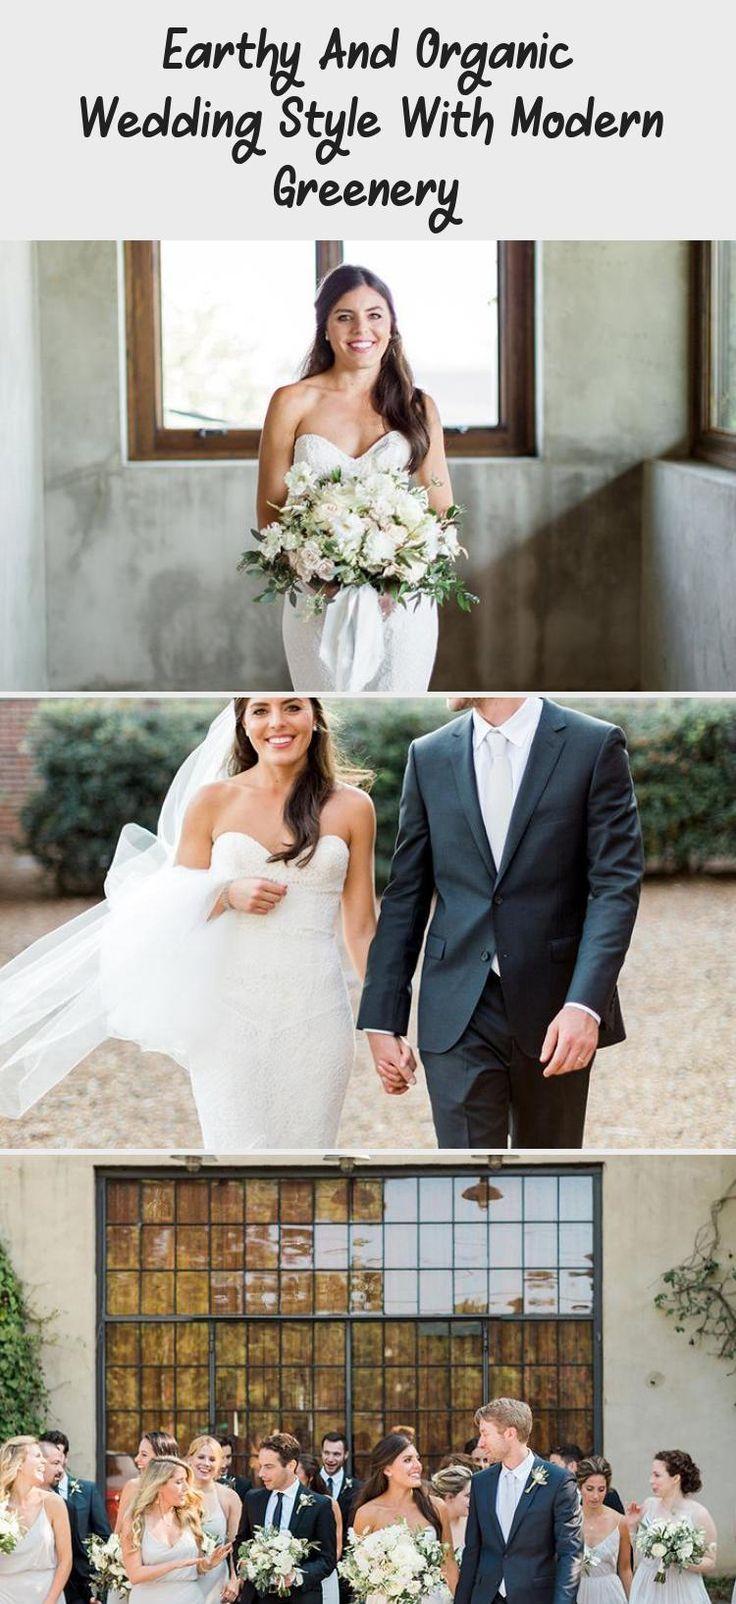 Rustic Draped Wedding Ceremony Backdrop with Modern Greenery and Candles #gardenweddingParty #gardenweddingGames #gardenweddingEntrance #Homegardenwedding #gardenweddingLights